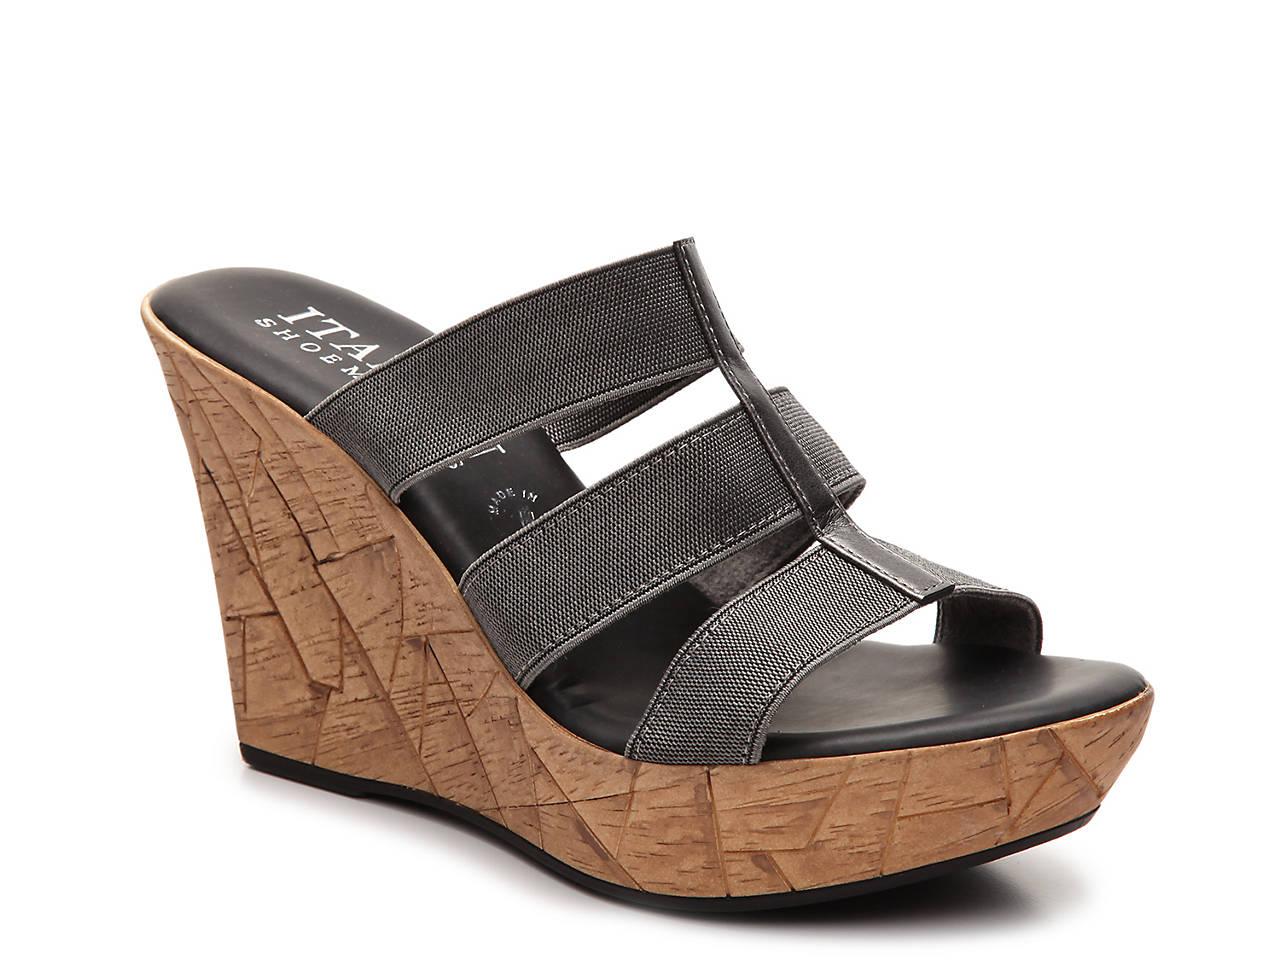 45e05545db11 Italian Shoemakers Mystic Wedge Sandal Women s Shoes